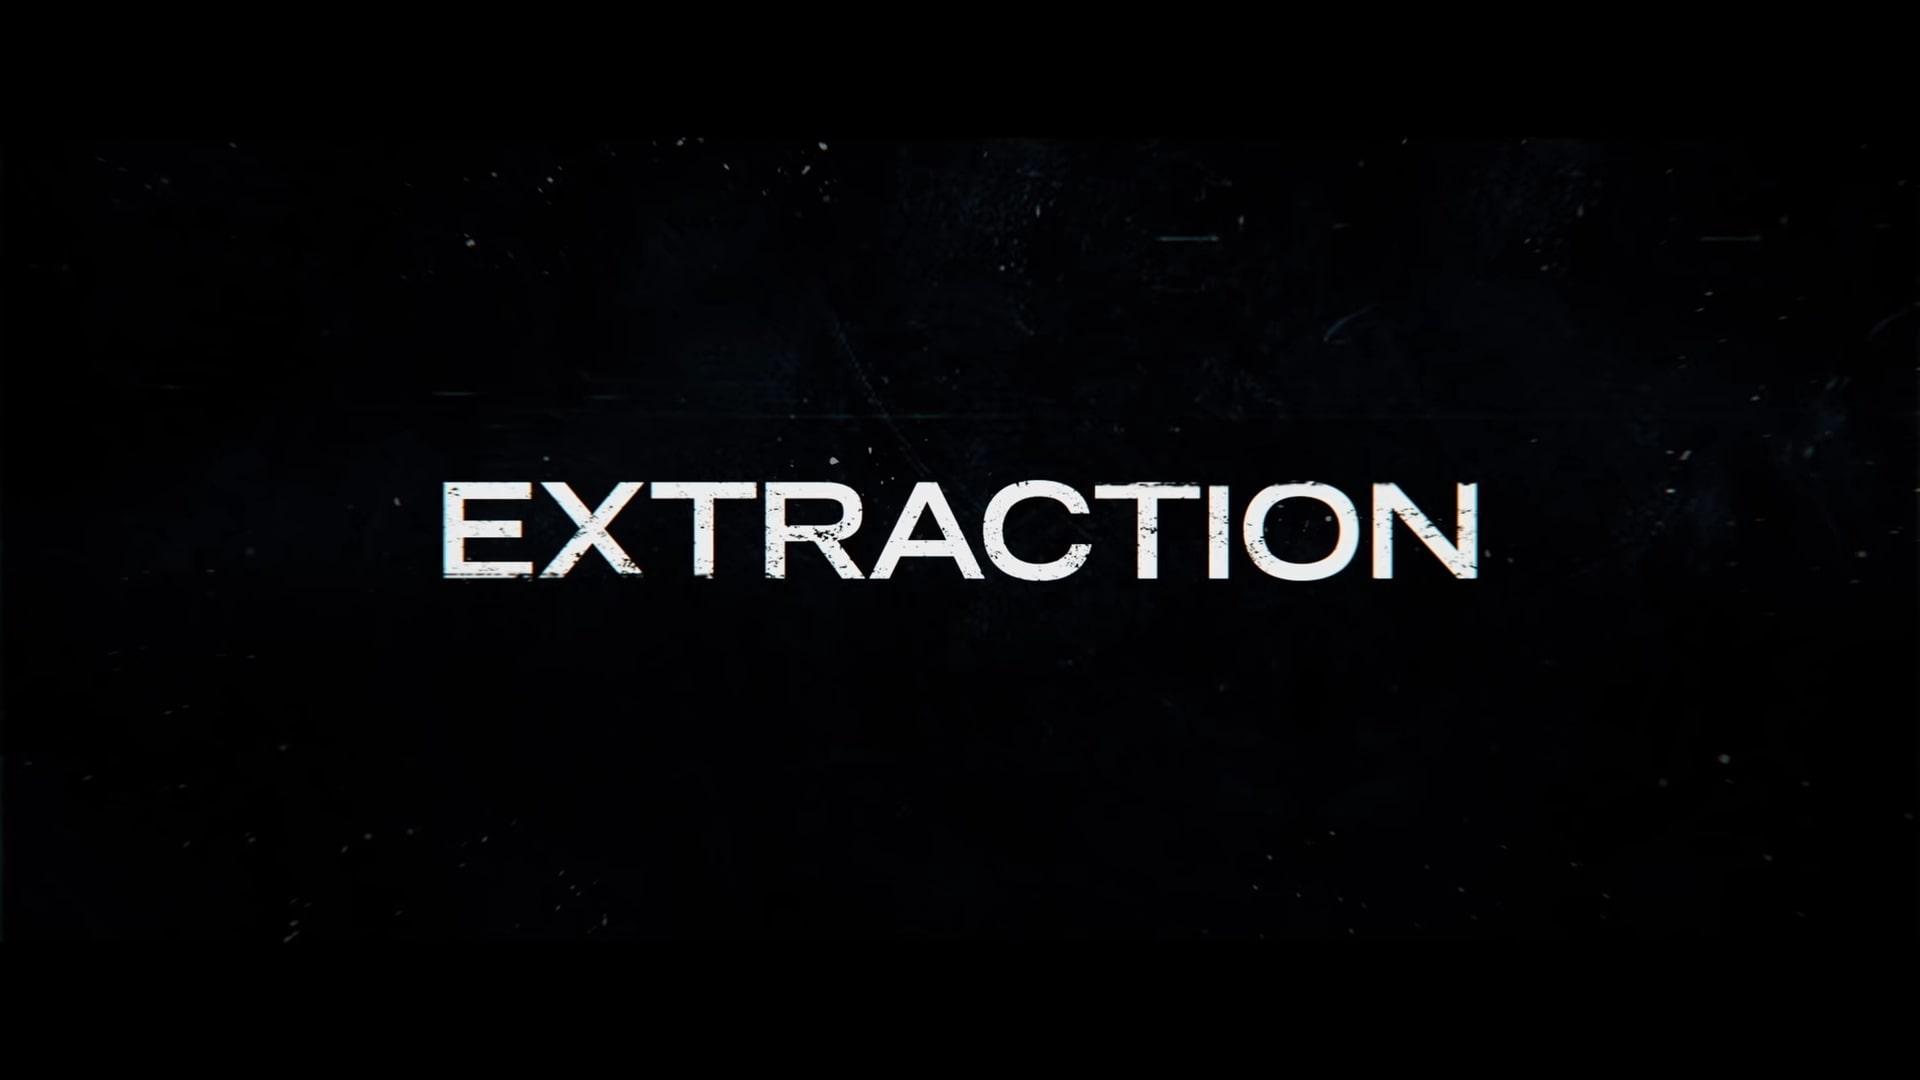 Extraction Netflix Wallpapers Top Free Extraction Netflix Backgrounds Wallpaperaccess